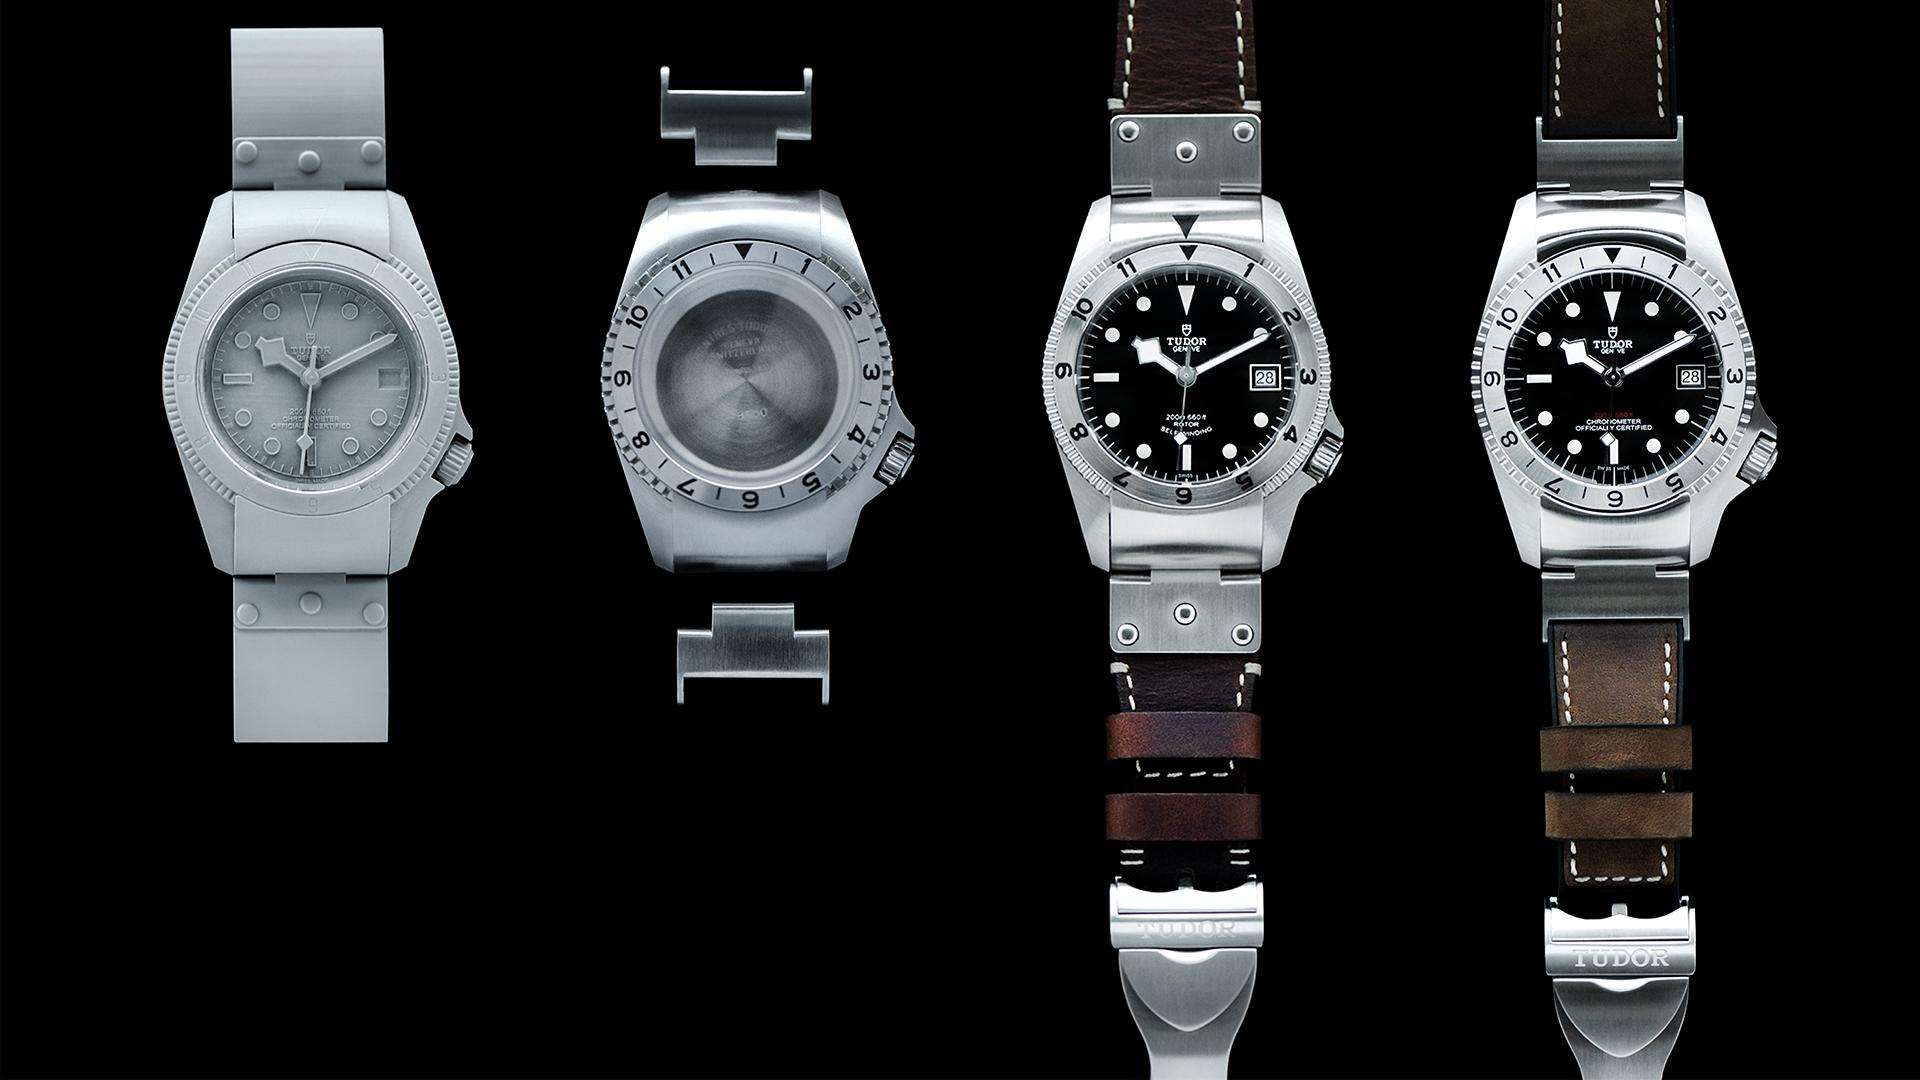 Tudor Watches factory tour